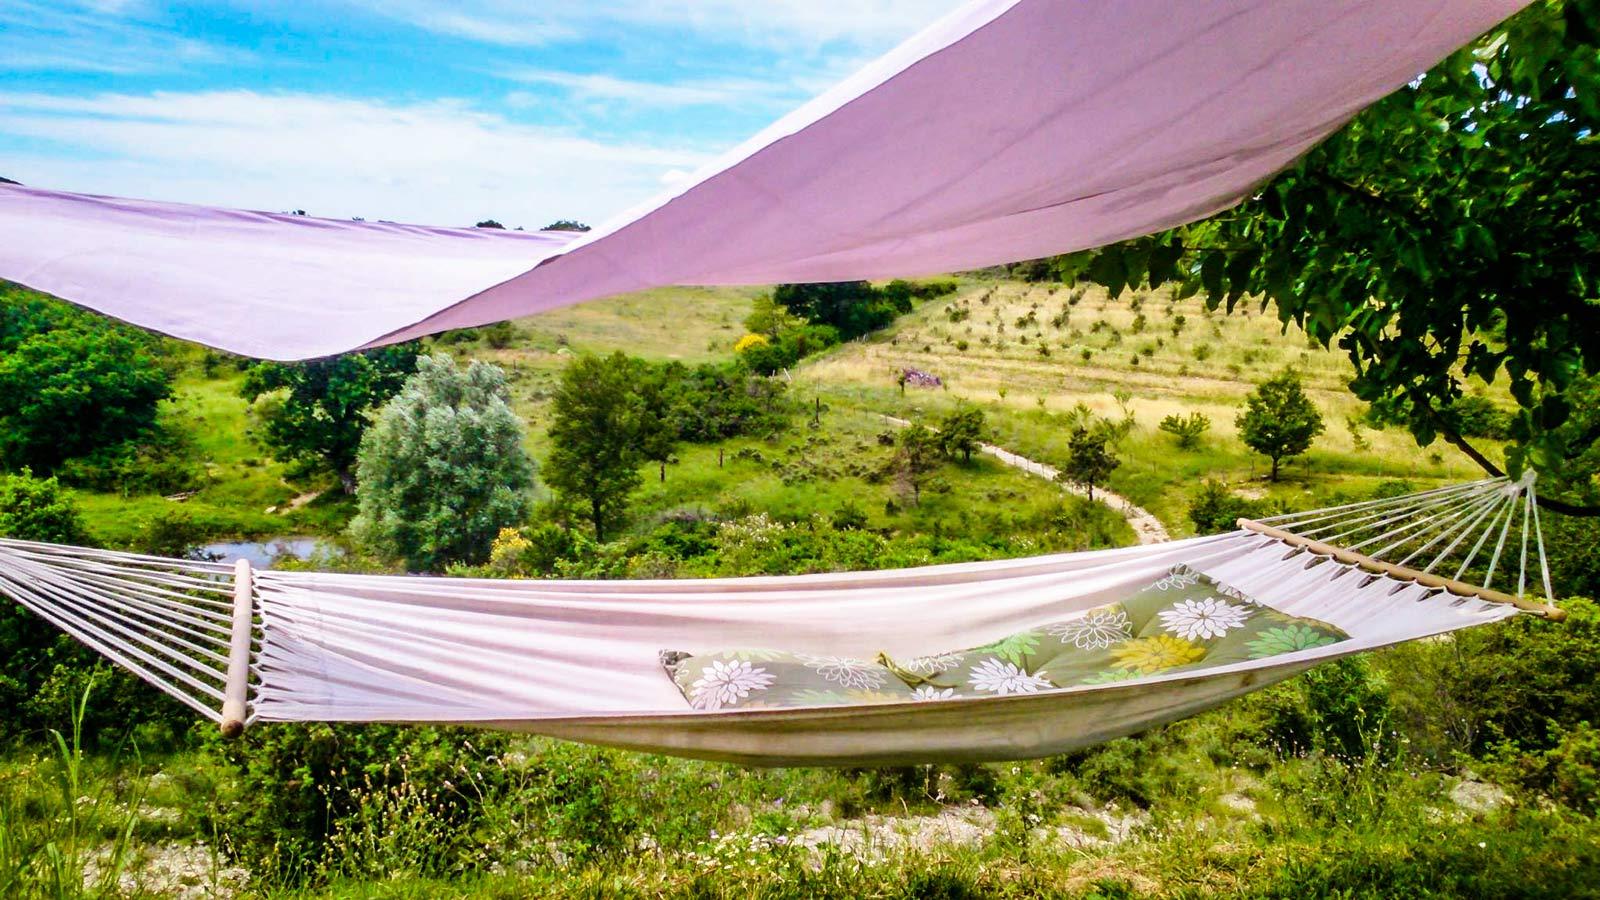 Camping vacances Ardèche